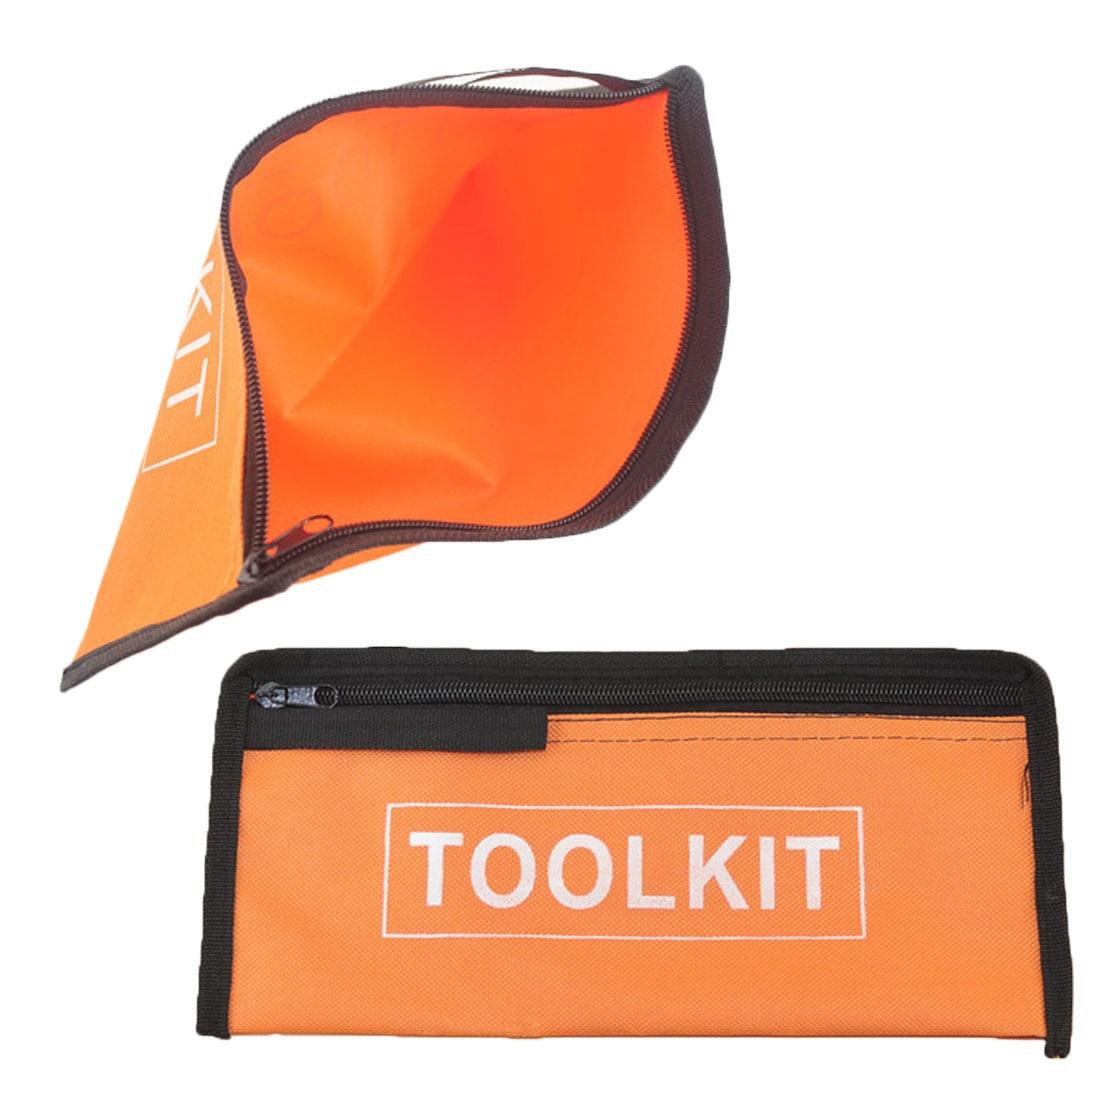 High Quality Hardware Tool Toolkit Storage Bag Oxford Handy Zip Pouch Handbag Waterproof